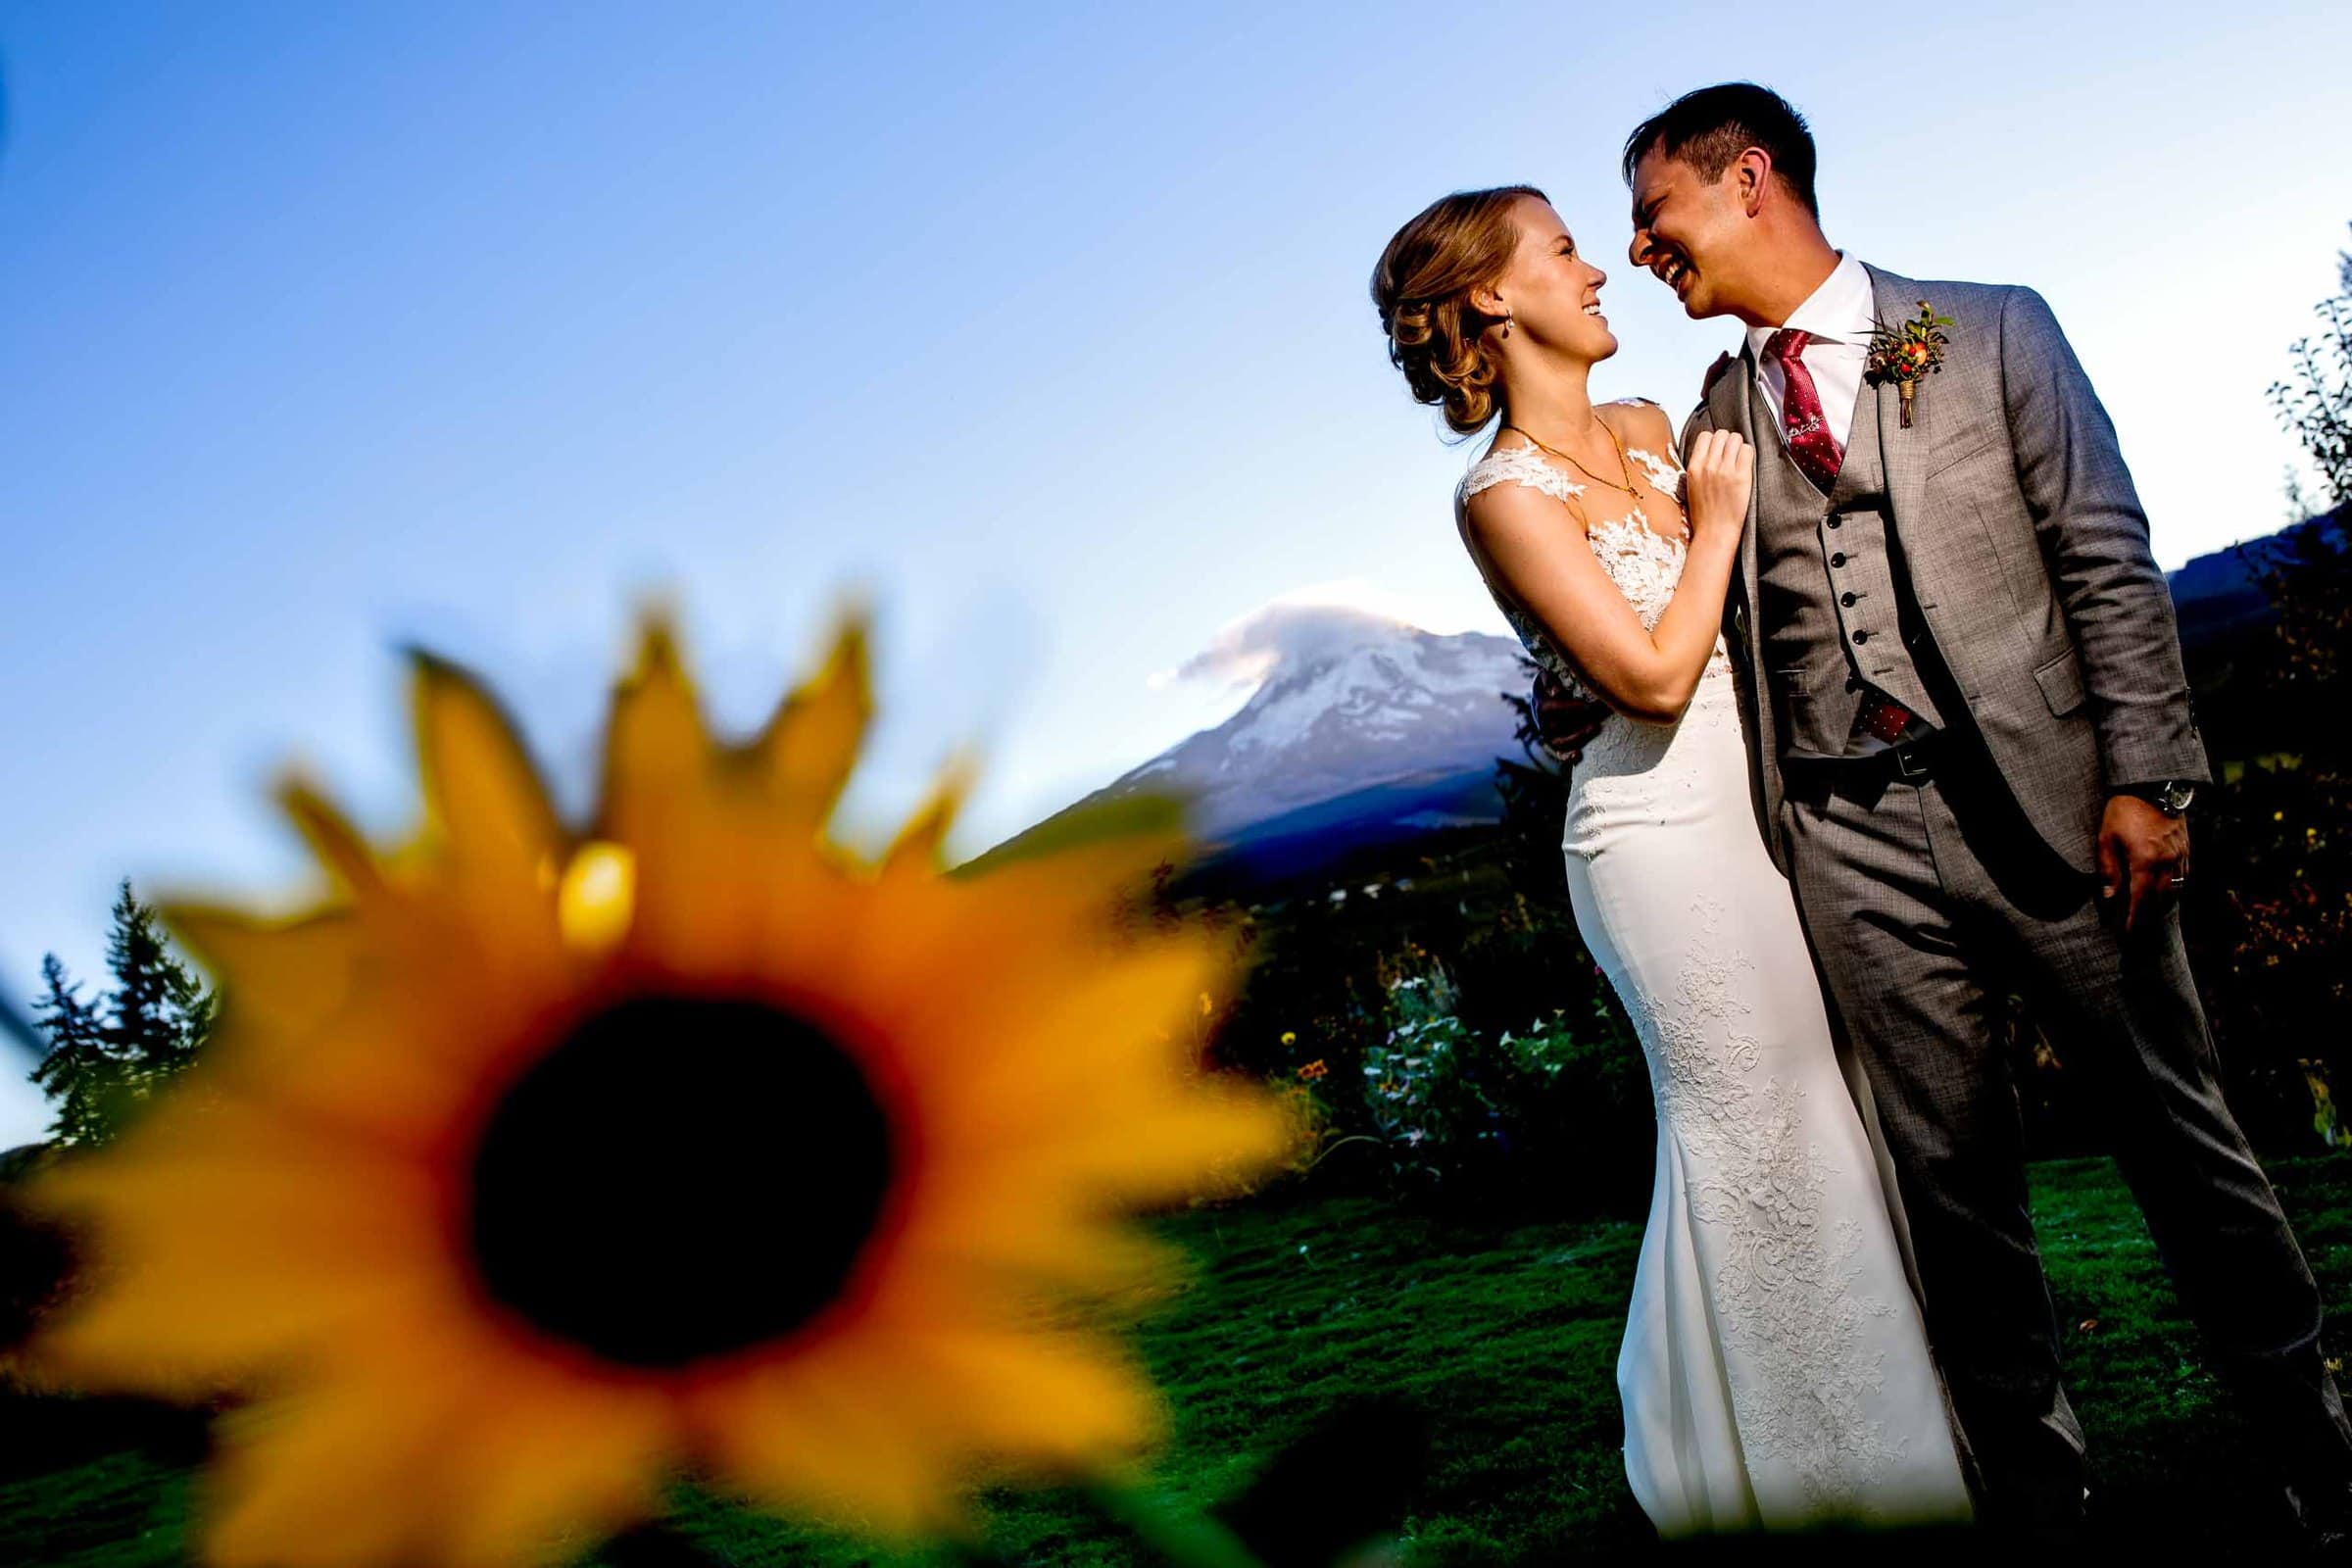 Bride and groom portrait through sun flowers during a Mt Hood Organic Farms wedding reception near Hood River Oregon